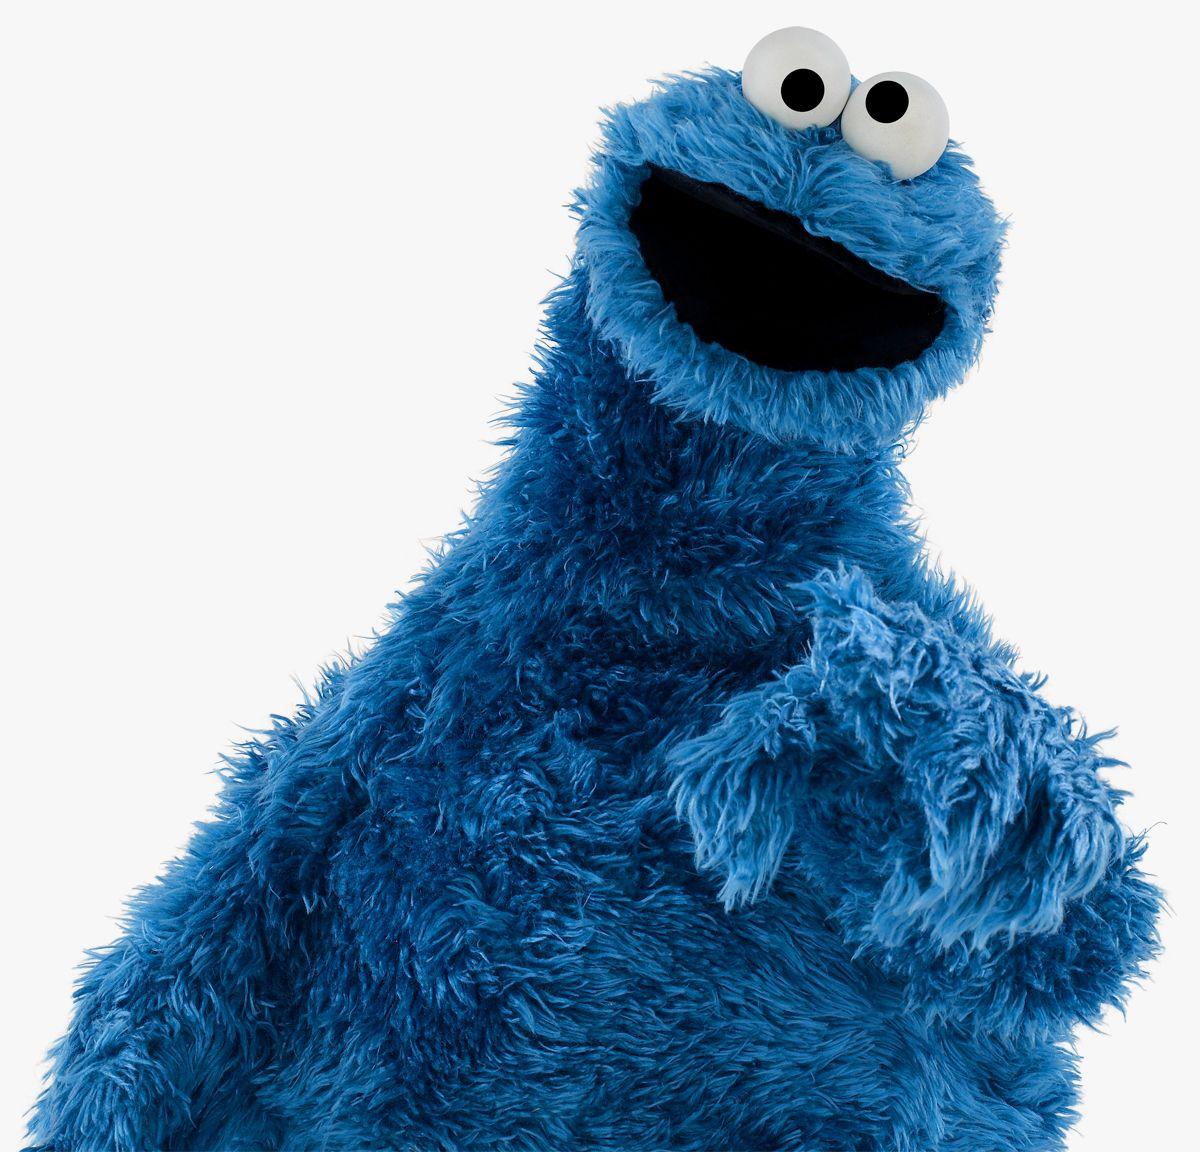 Blue Cookie Monster Sesame Street Cookie Monster The Muppet Show Sesame Street